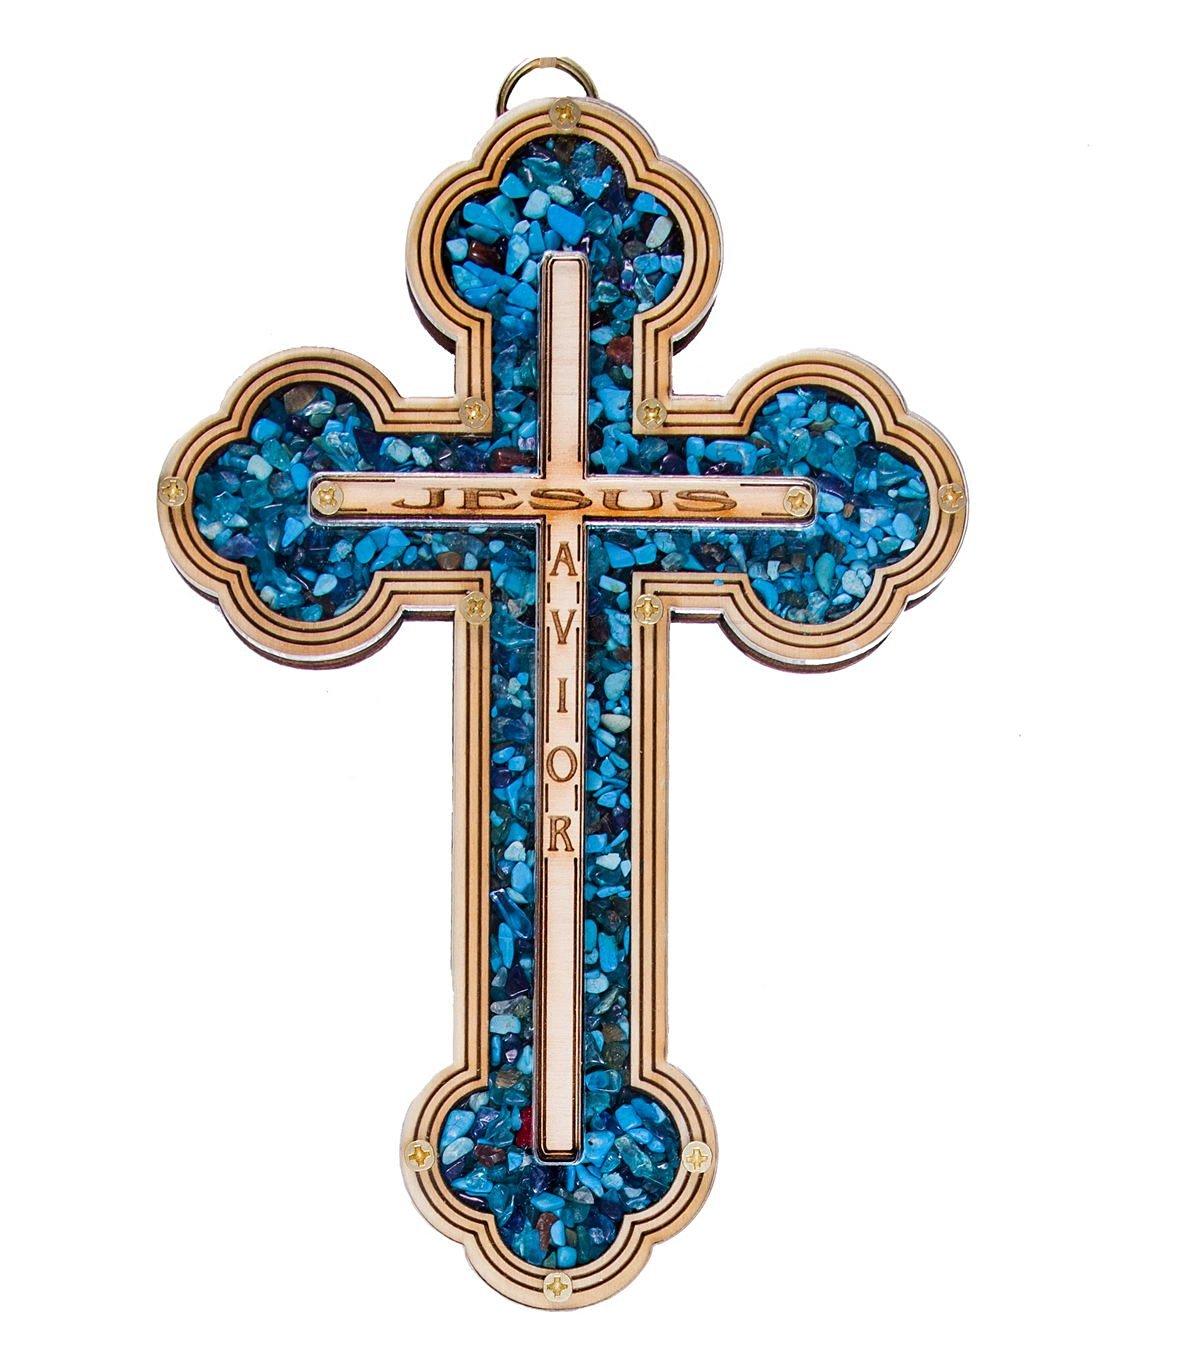 Buy JESUS SAVIOR Wall Wood Cross with Natural TURQUOISE